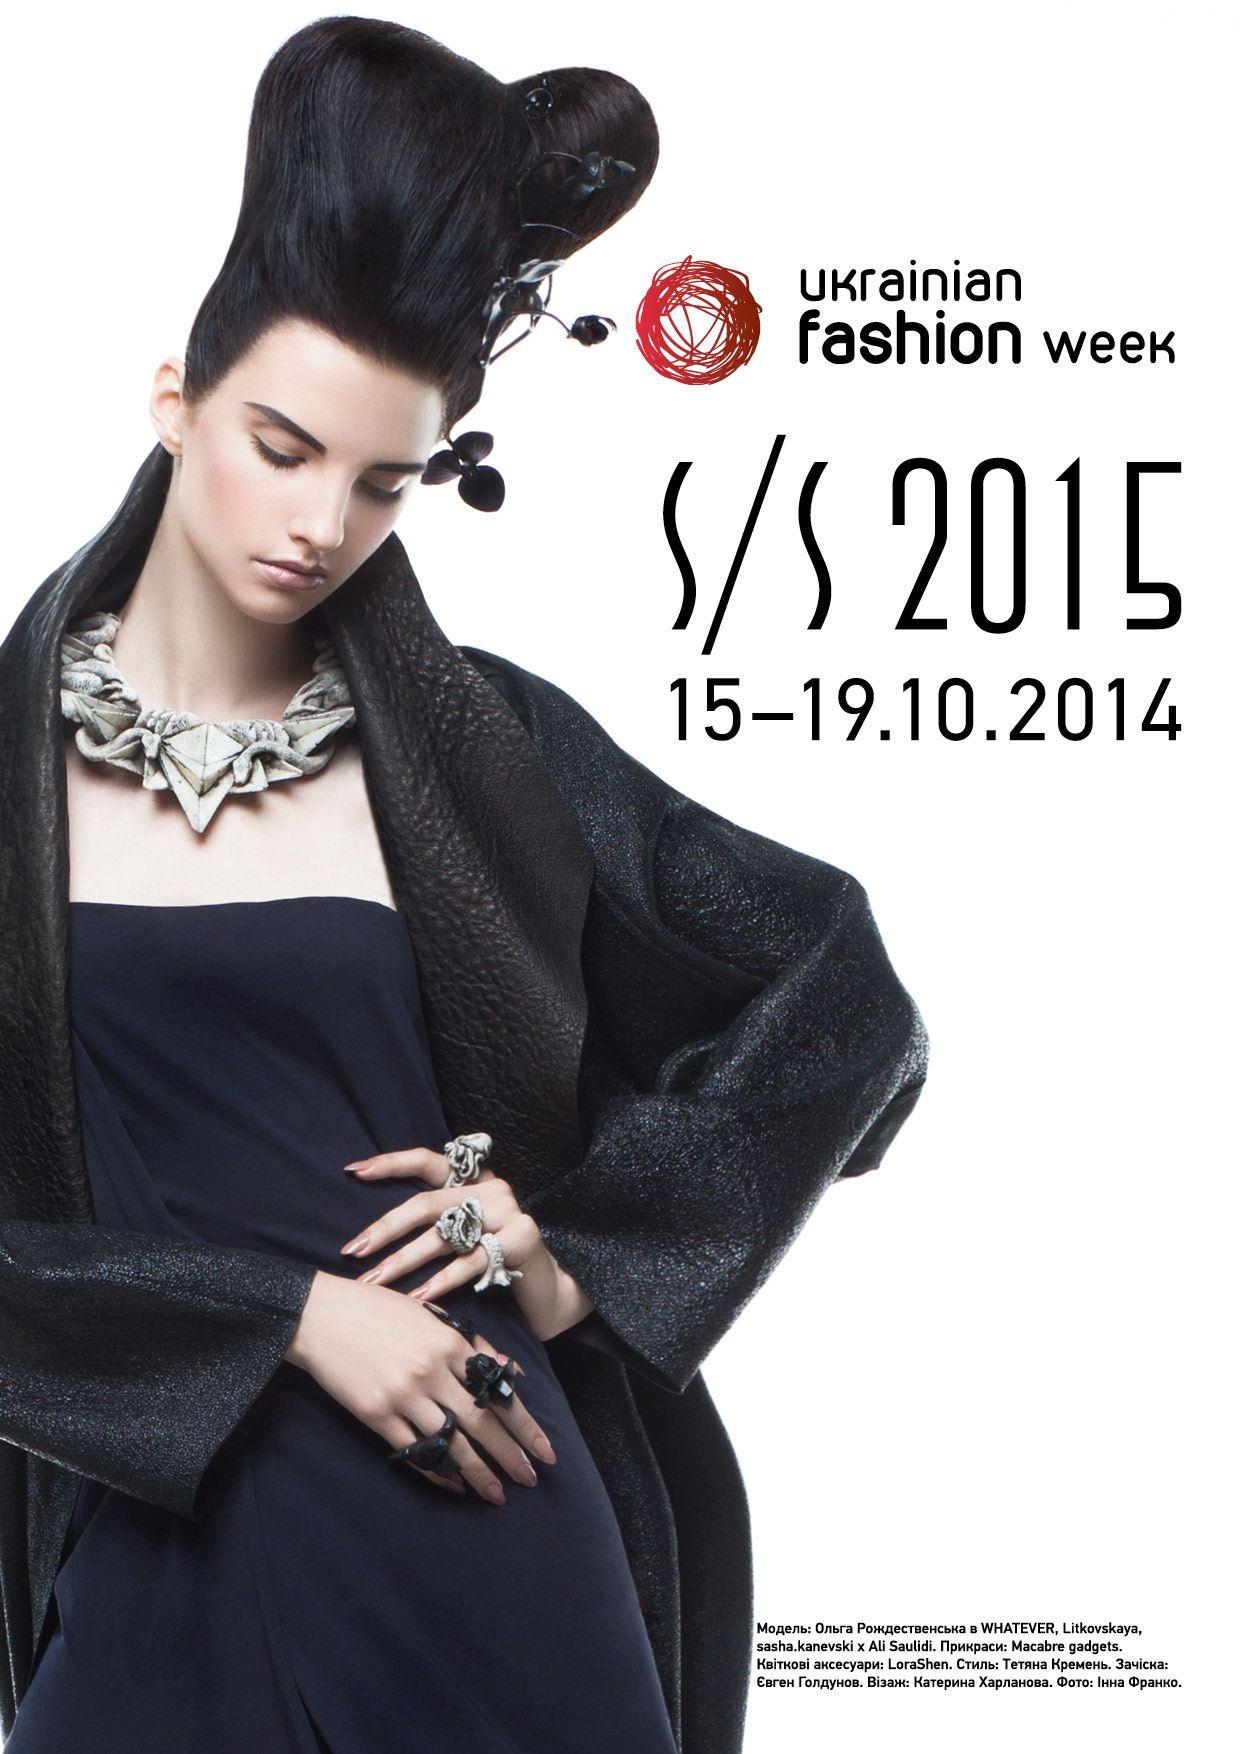 Ukrainian Fashion Week 2014